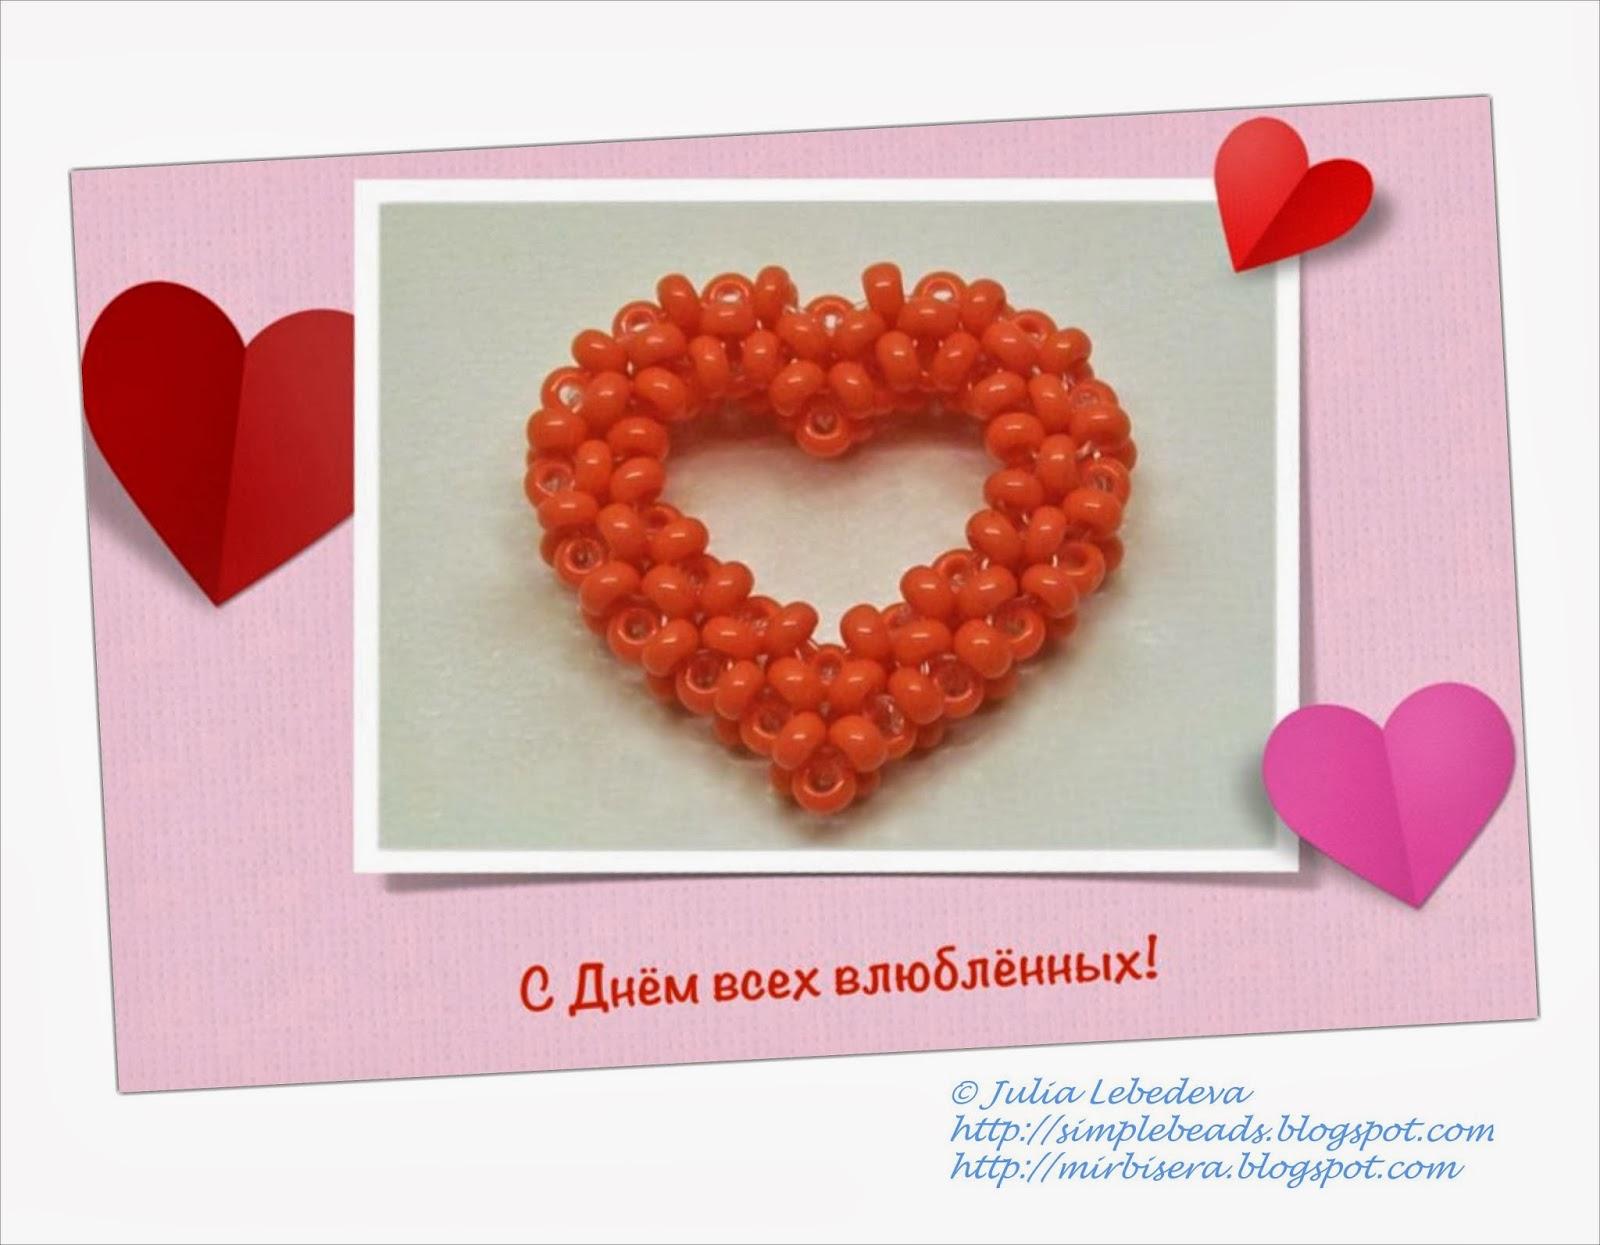 Валентинка с сердечком из бисера